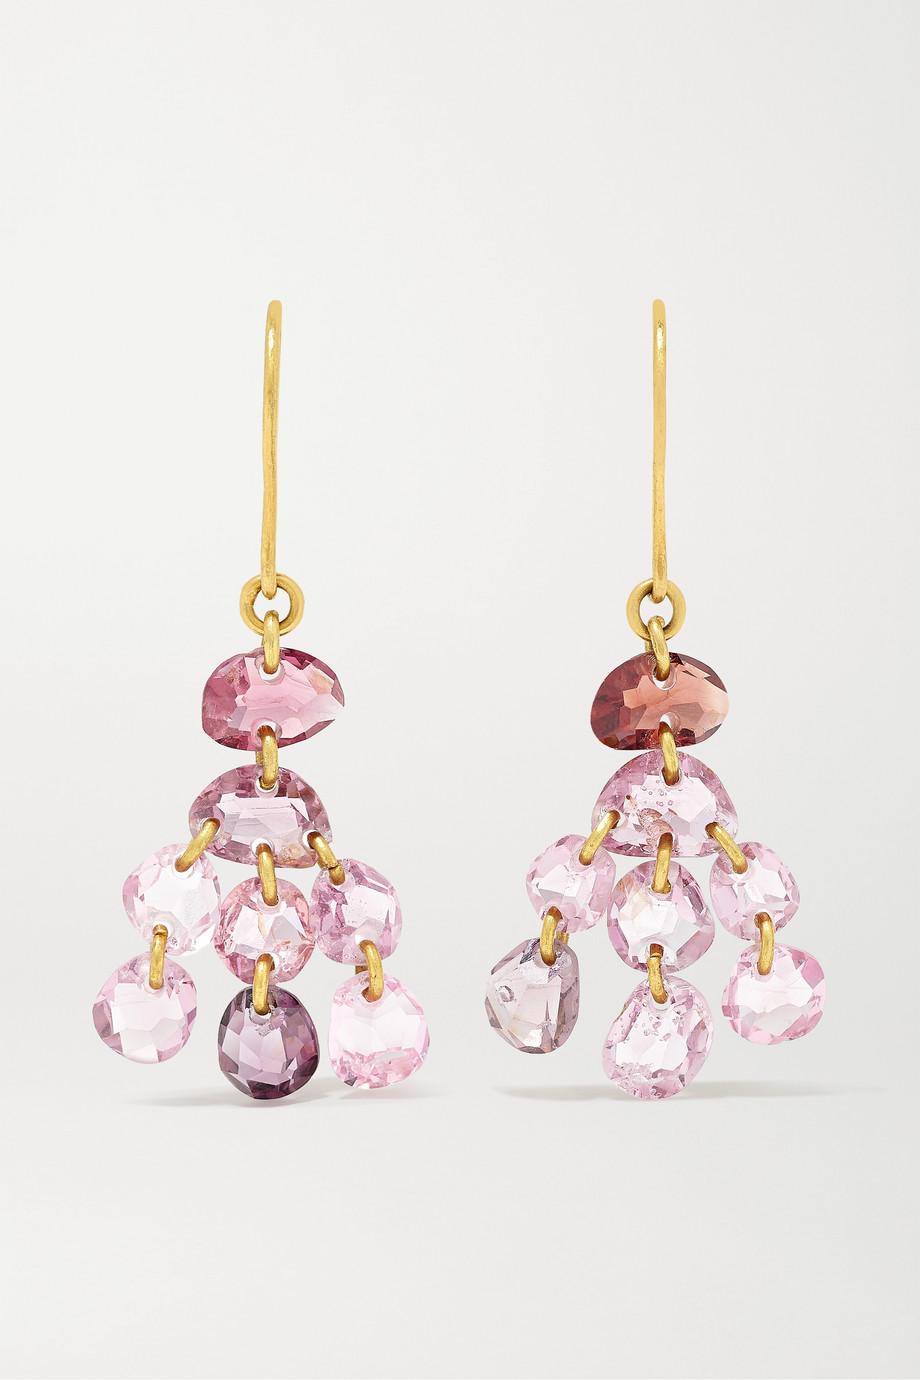 Pippa Small 18-karat gold spinel earrings